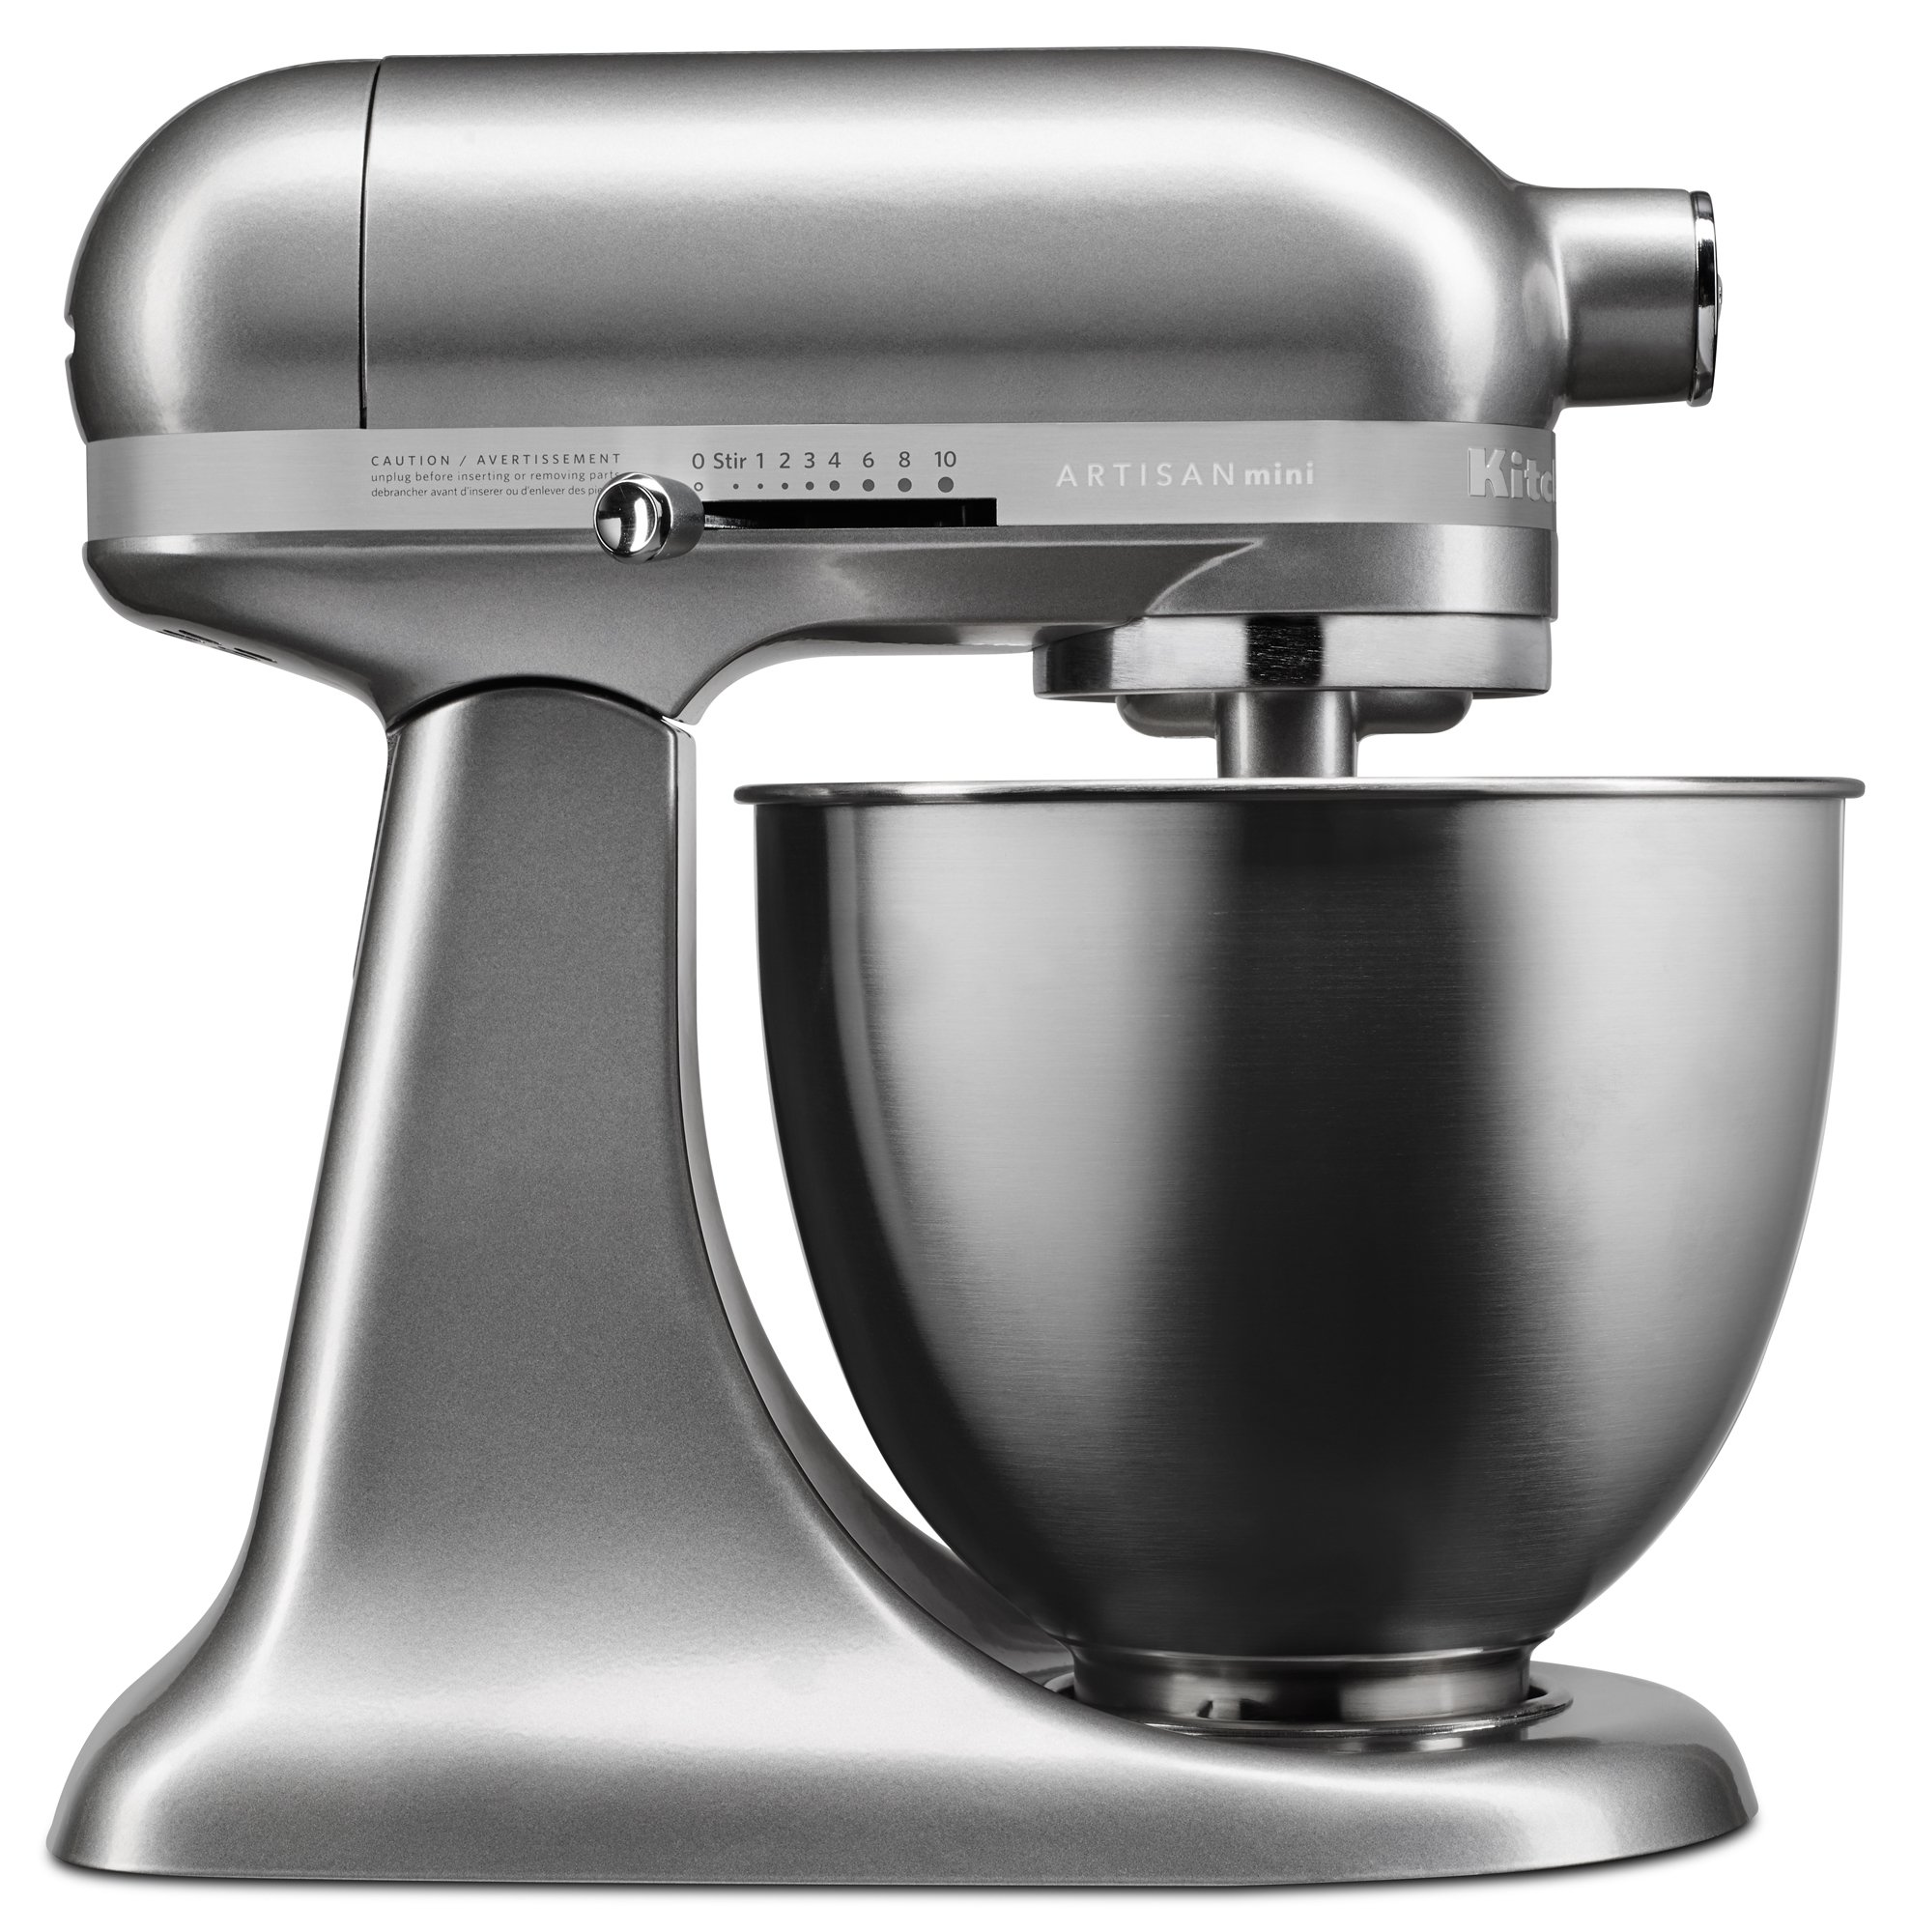 KitchenAid KSM3311XCU Artisan Mini Series Tilt-Head Stand Mixer, 3.5 quart, Contour Silver by KitchenAid